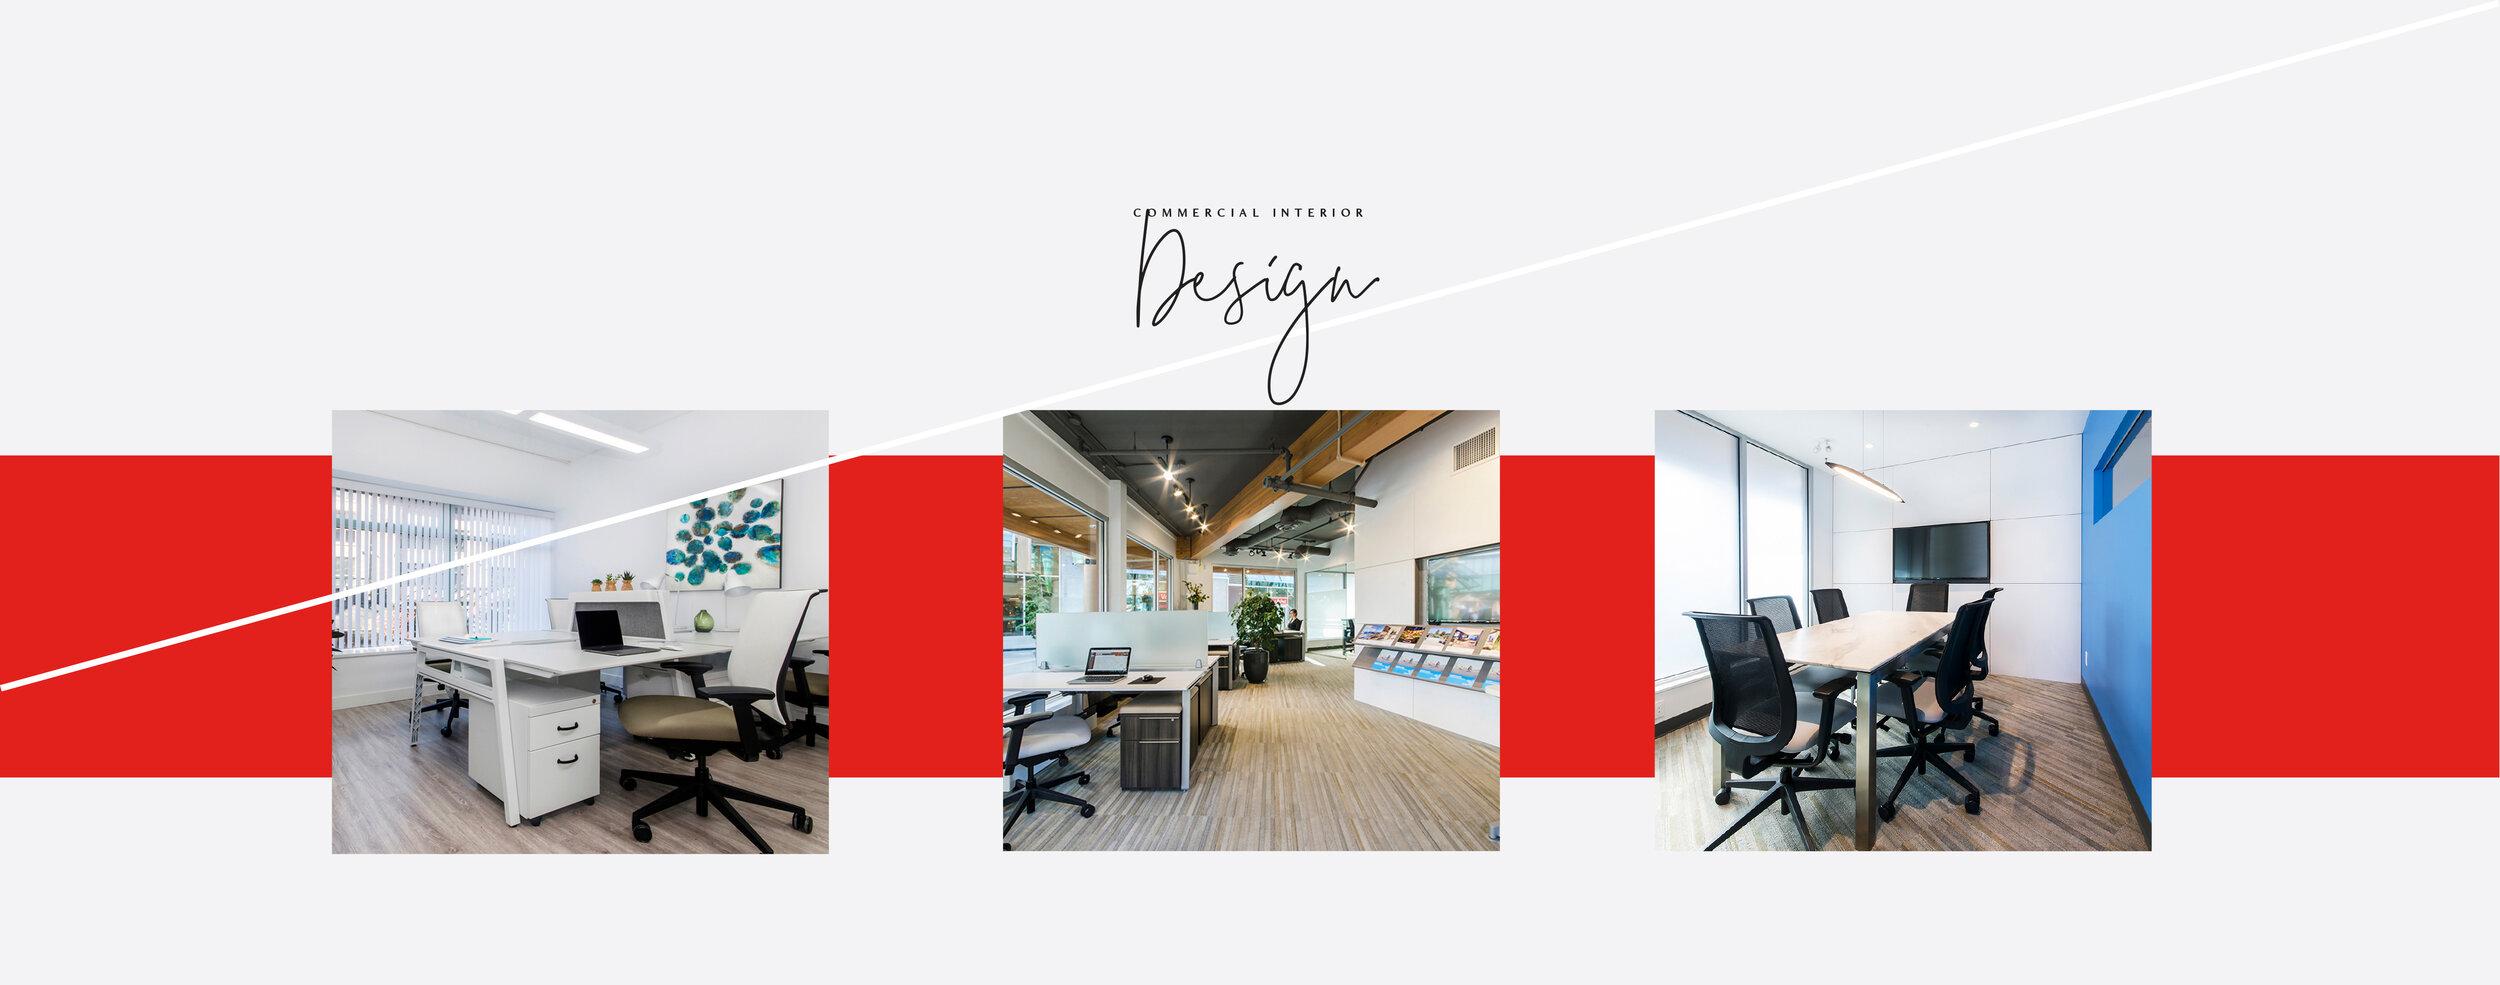 vancouver interior design 4.jpg